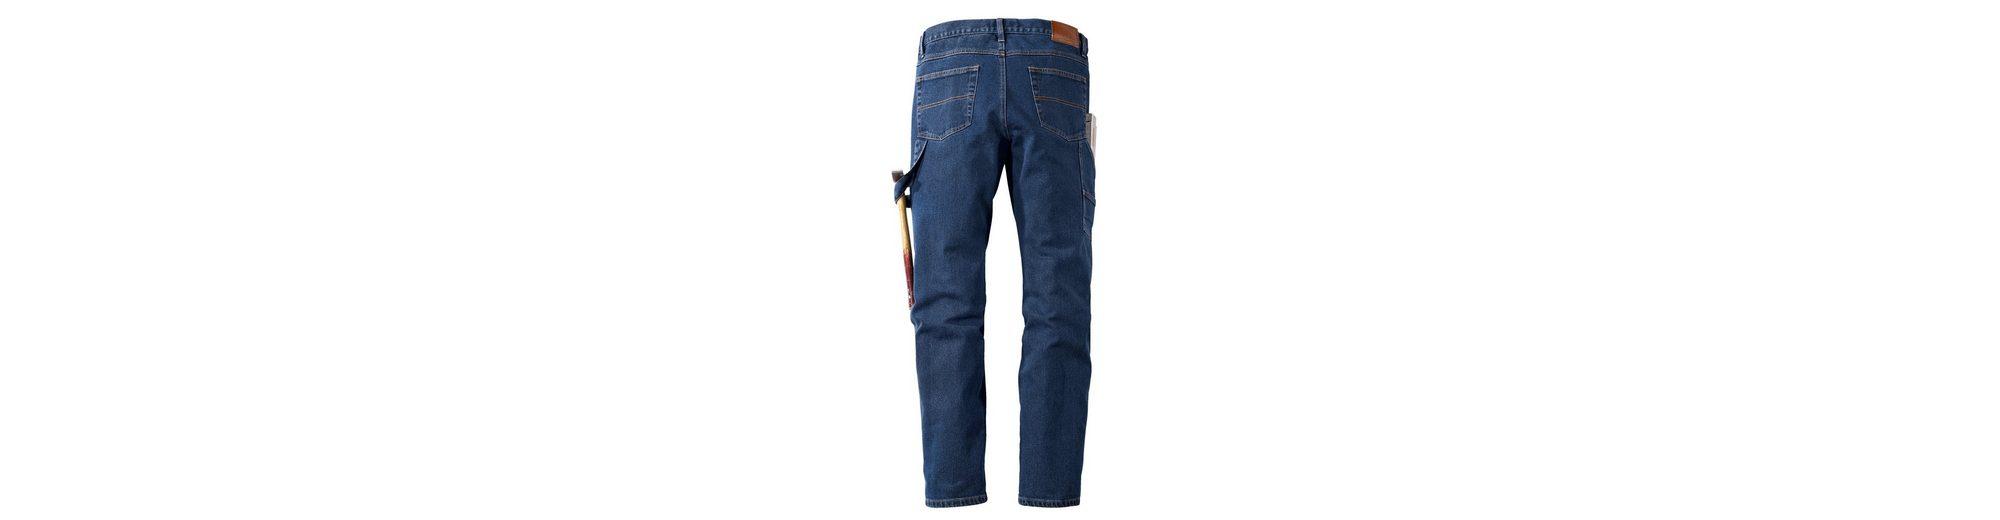 Men Plus Happy Happy by Jeans Men Arbeitshose by Arbeitshose Plus Men Size Size Jeans Plus ZAqfnF